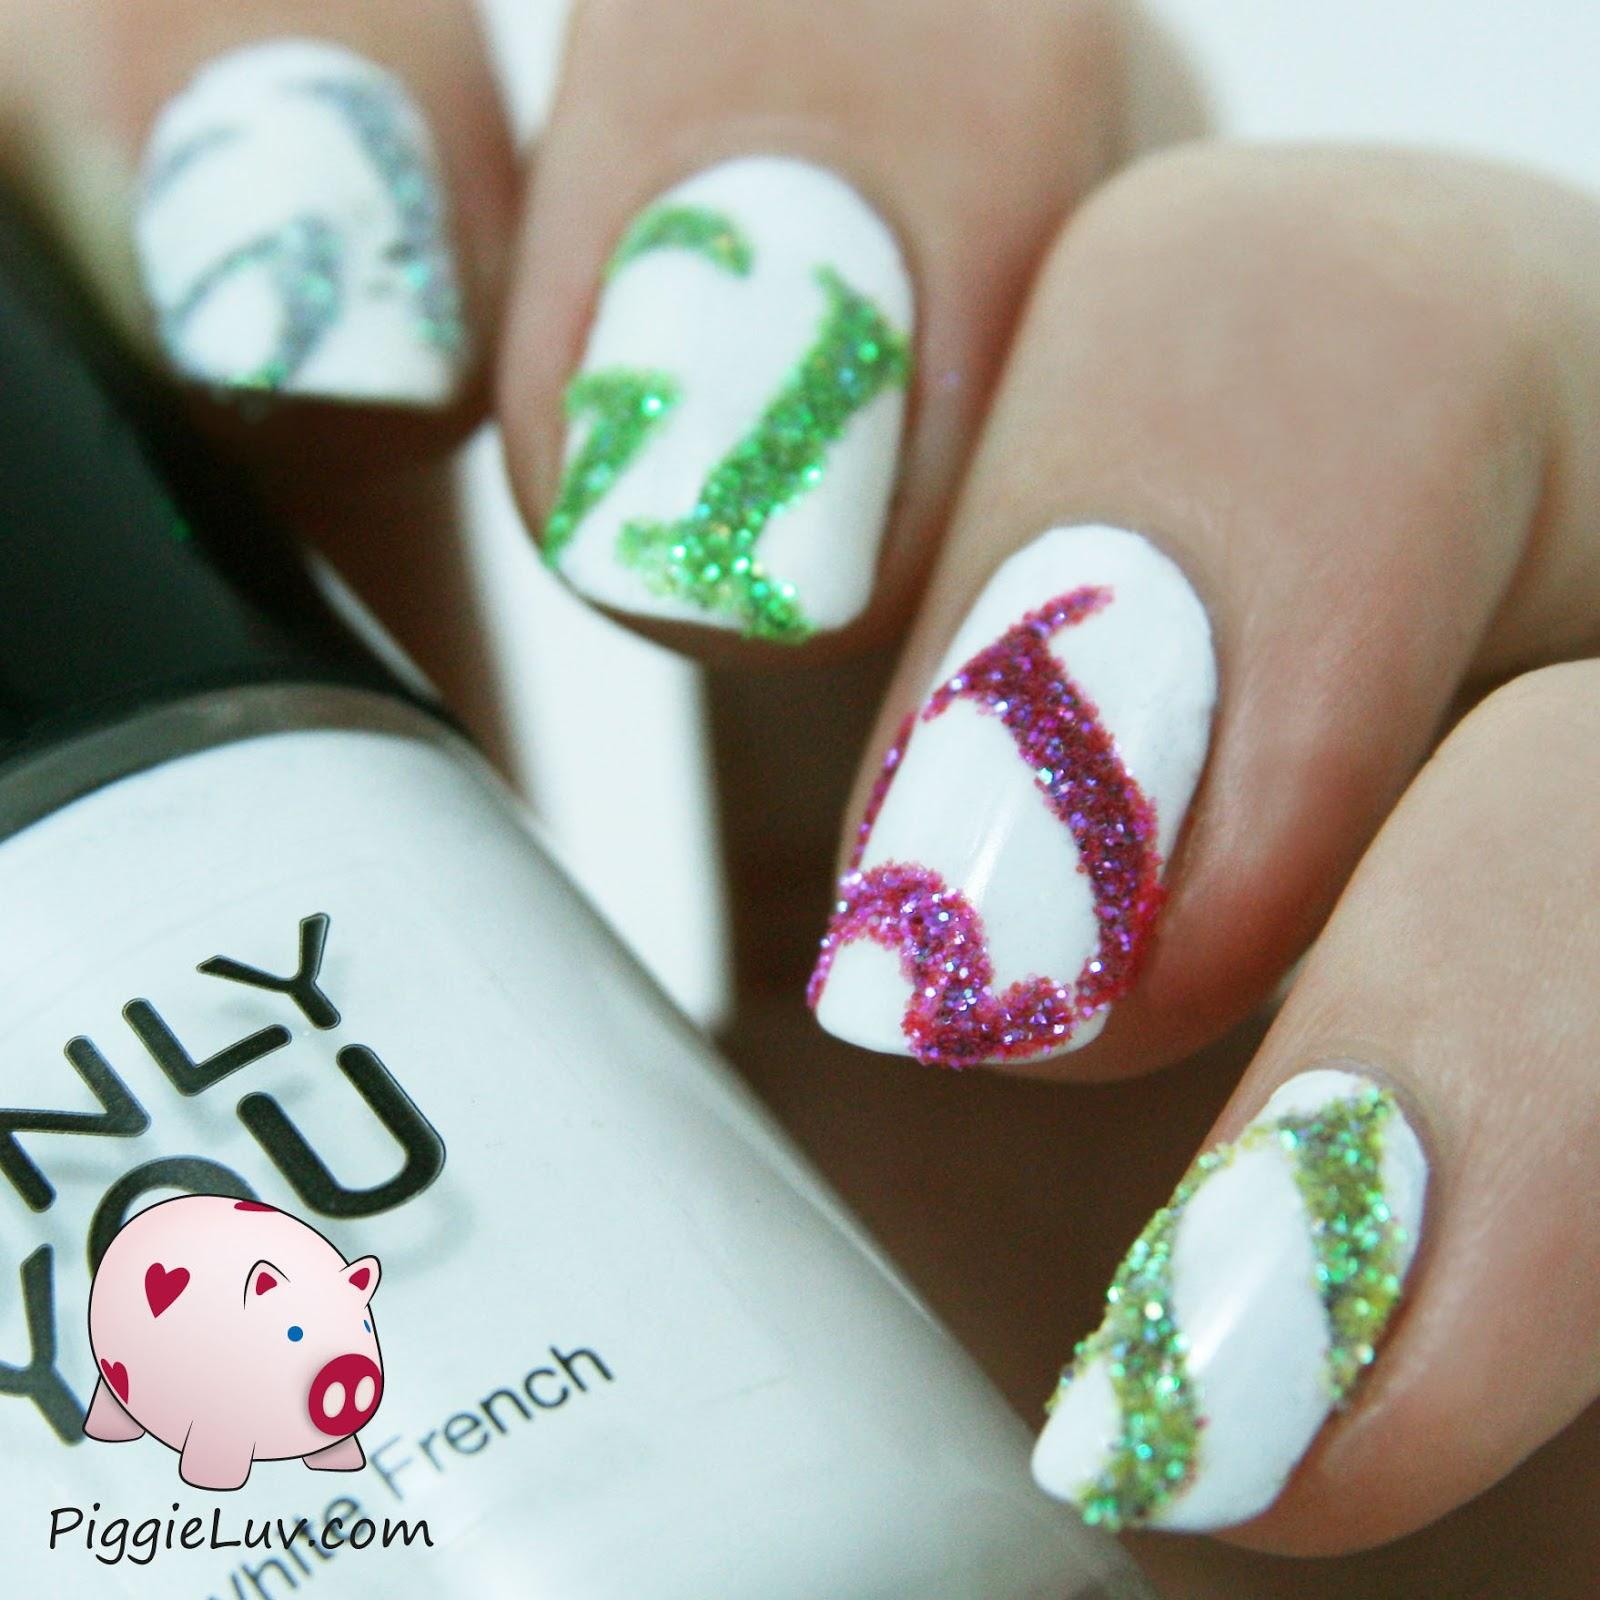 PiggieLuv: Glitter newspaper nails